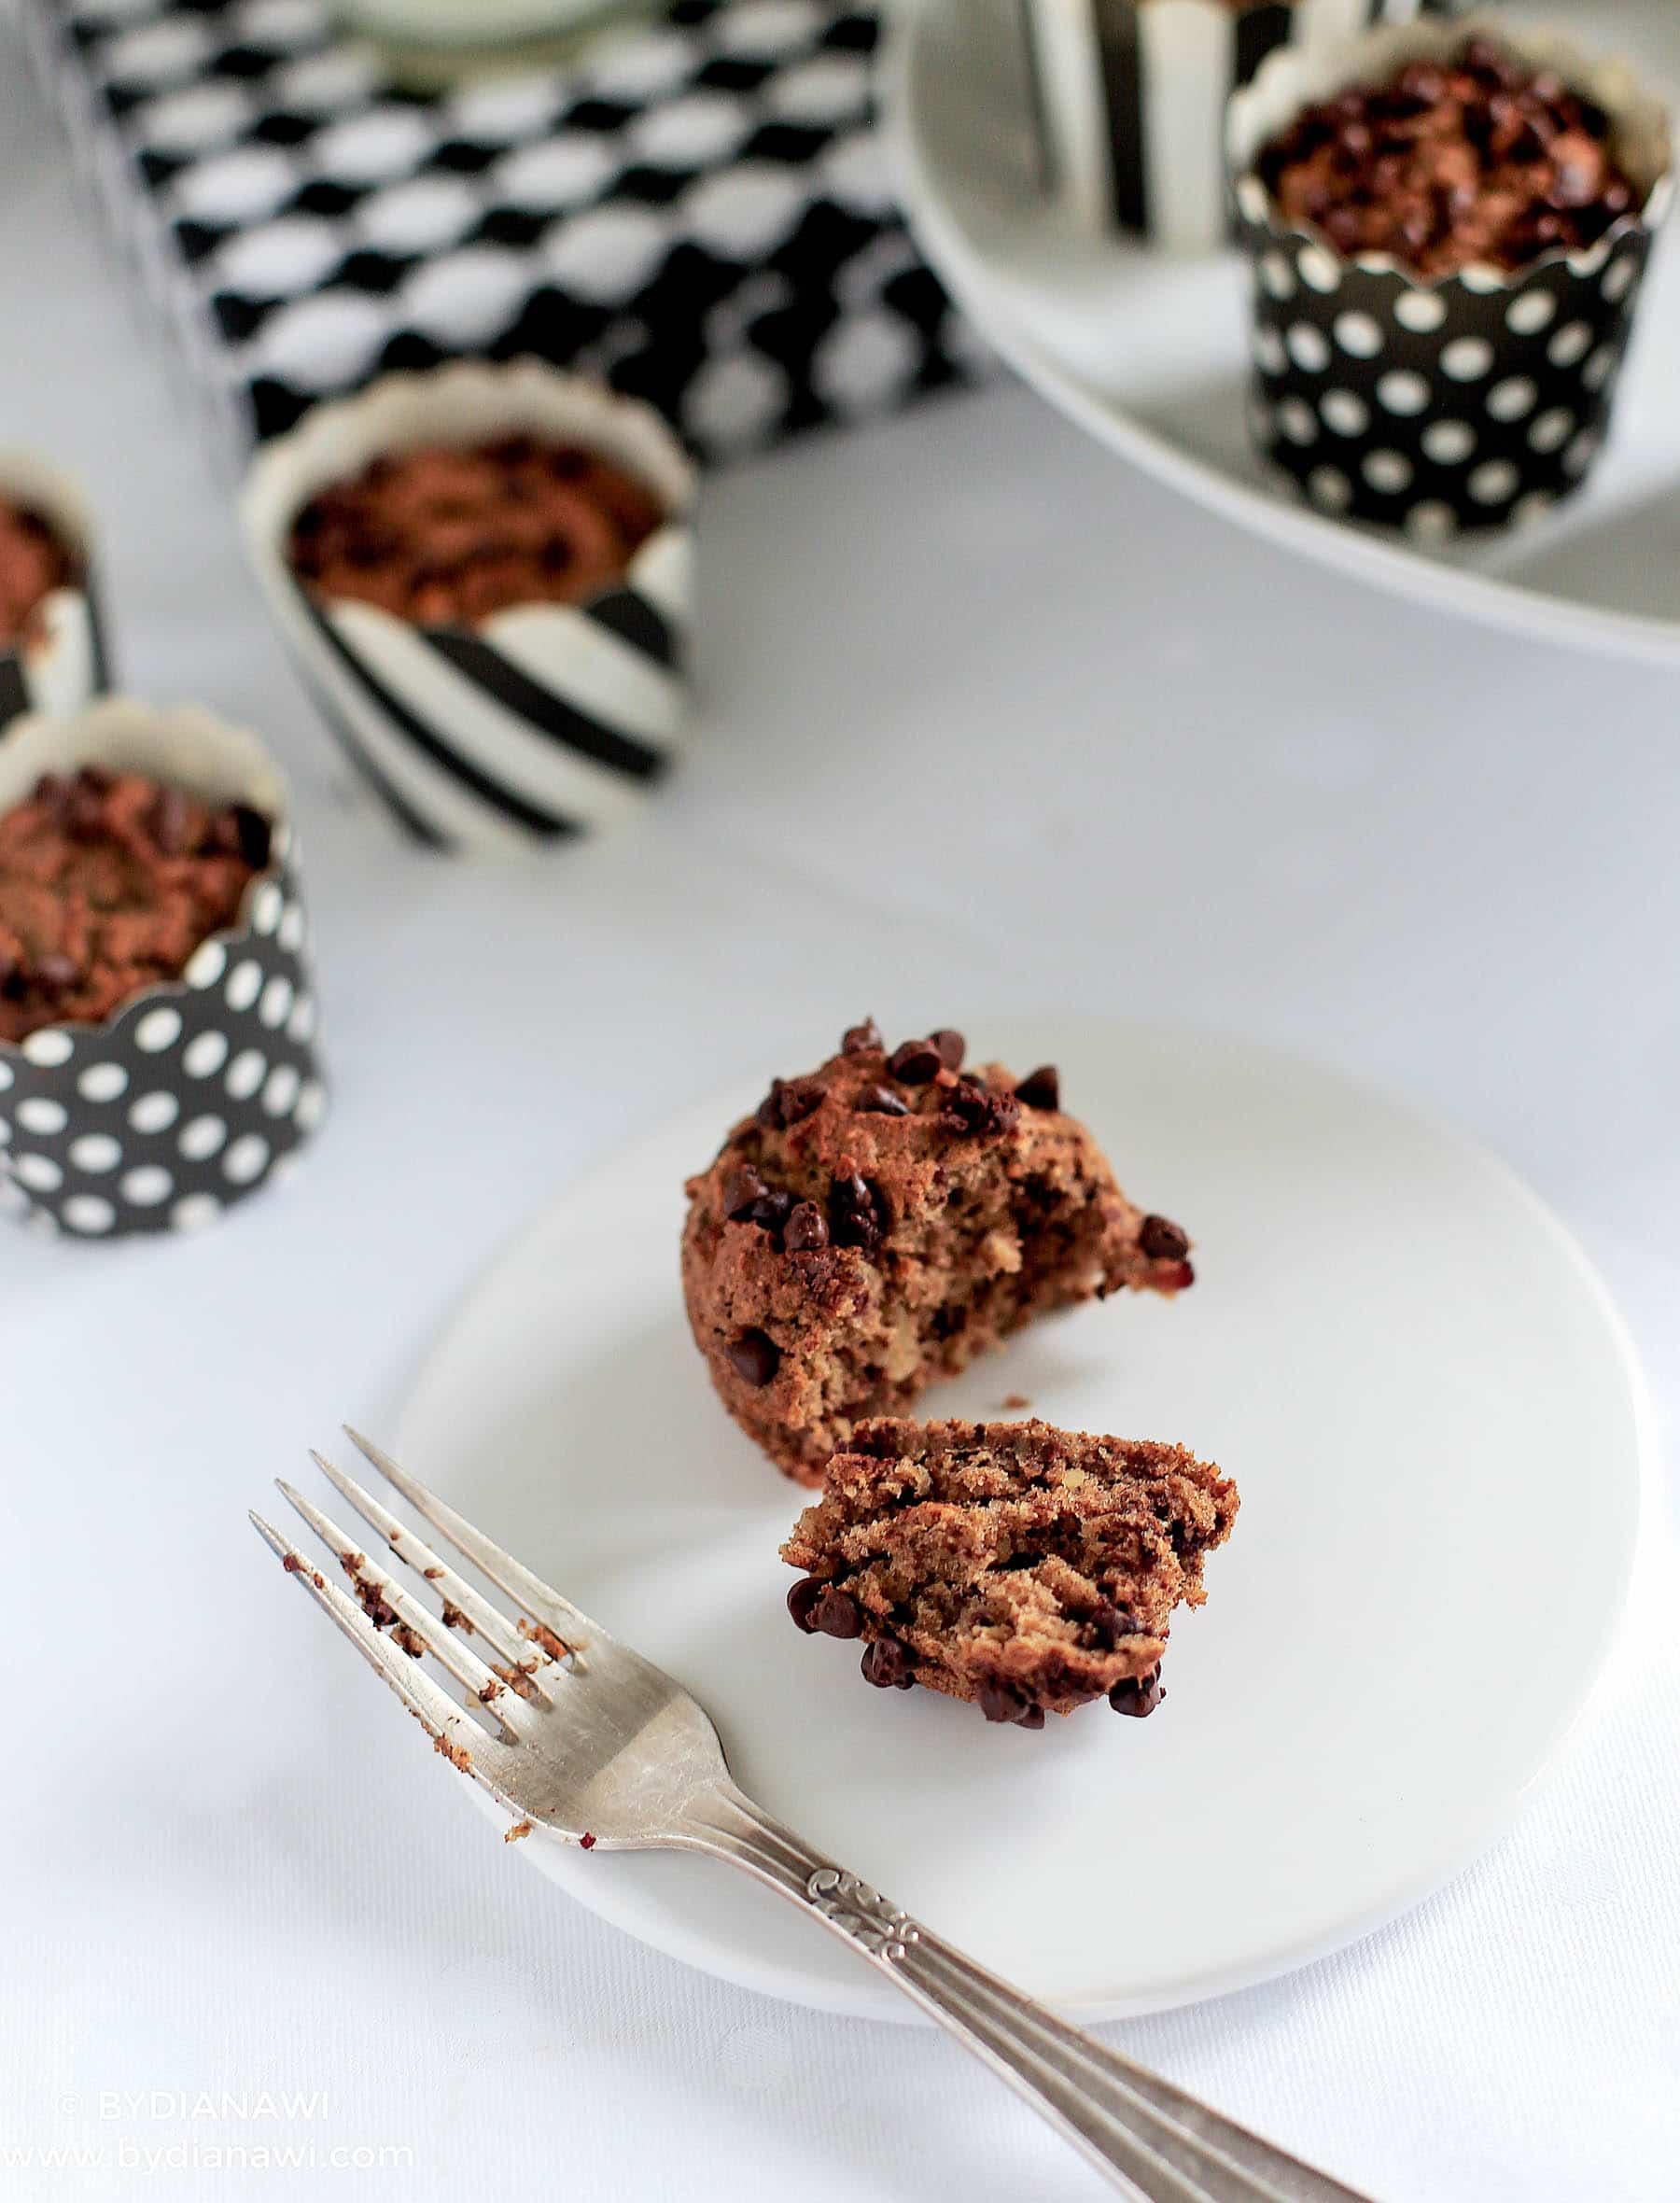 sund kage, sund dessert, bananmuffins uden sukker og uden mel